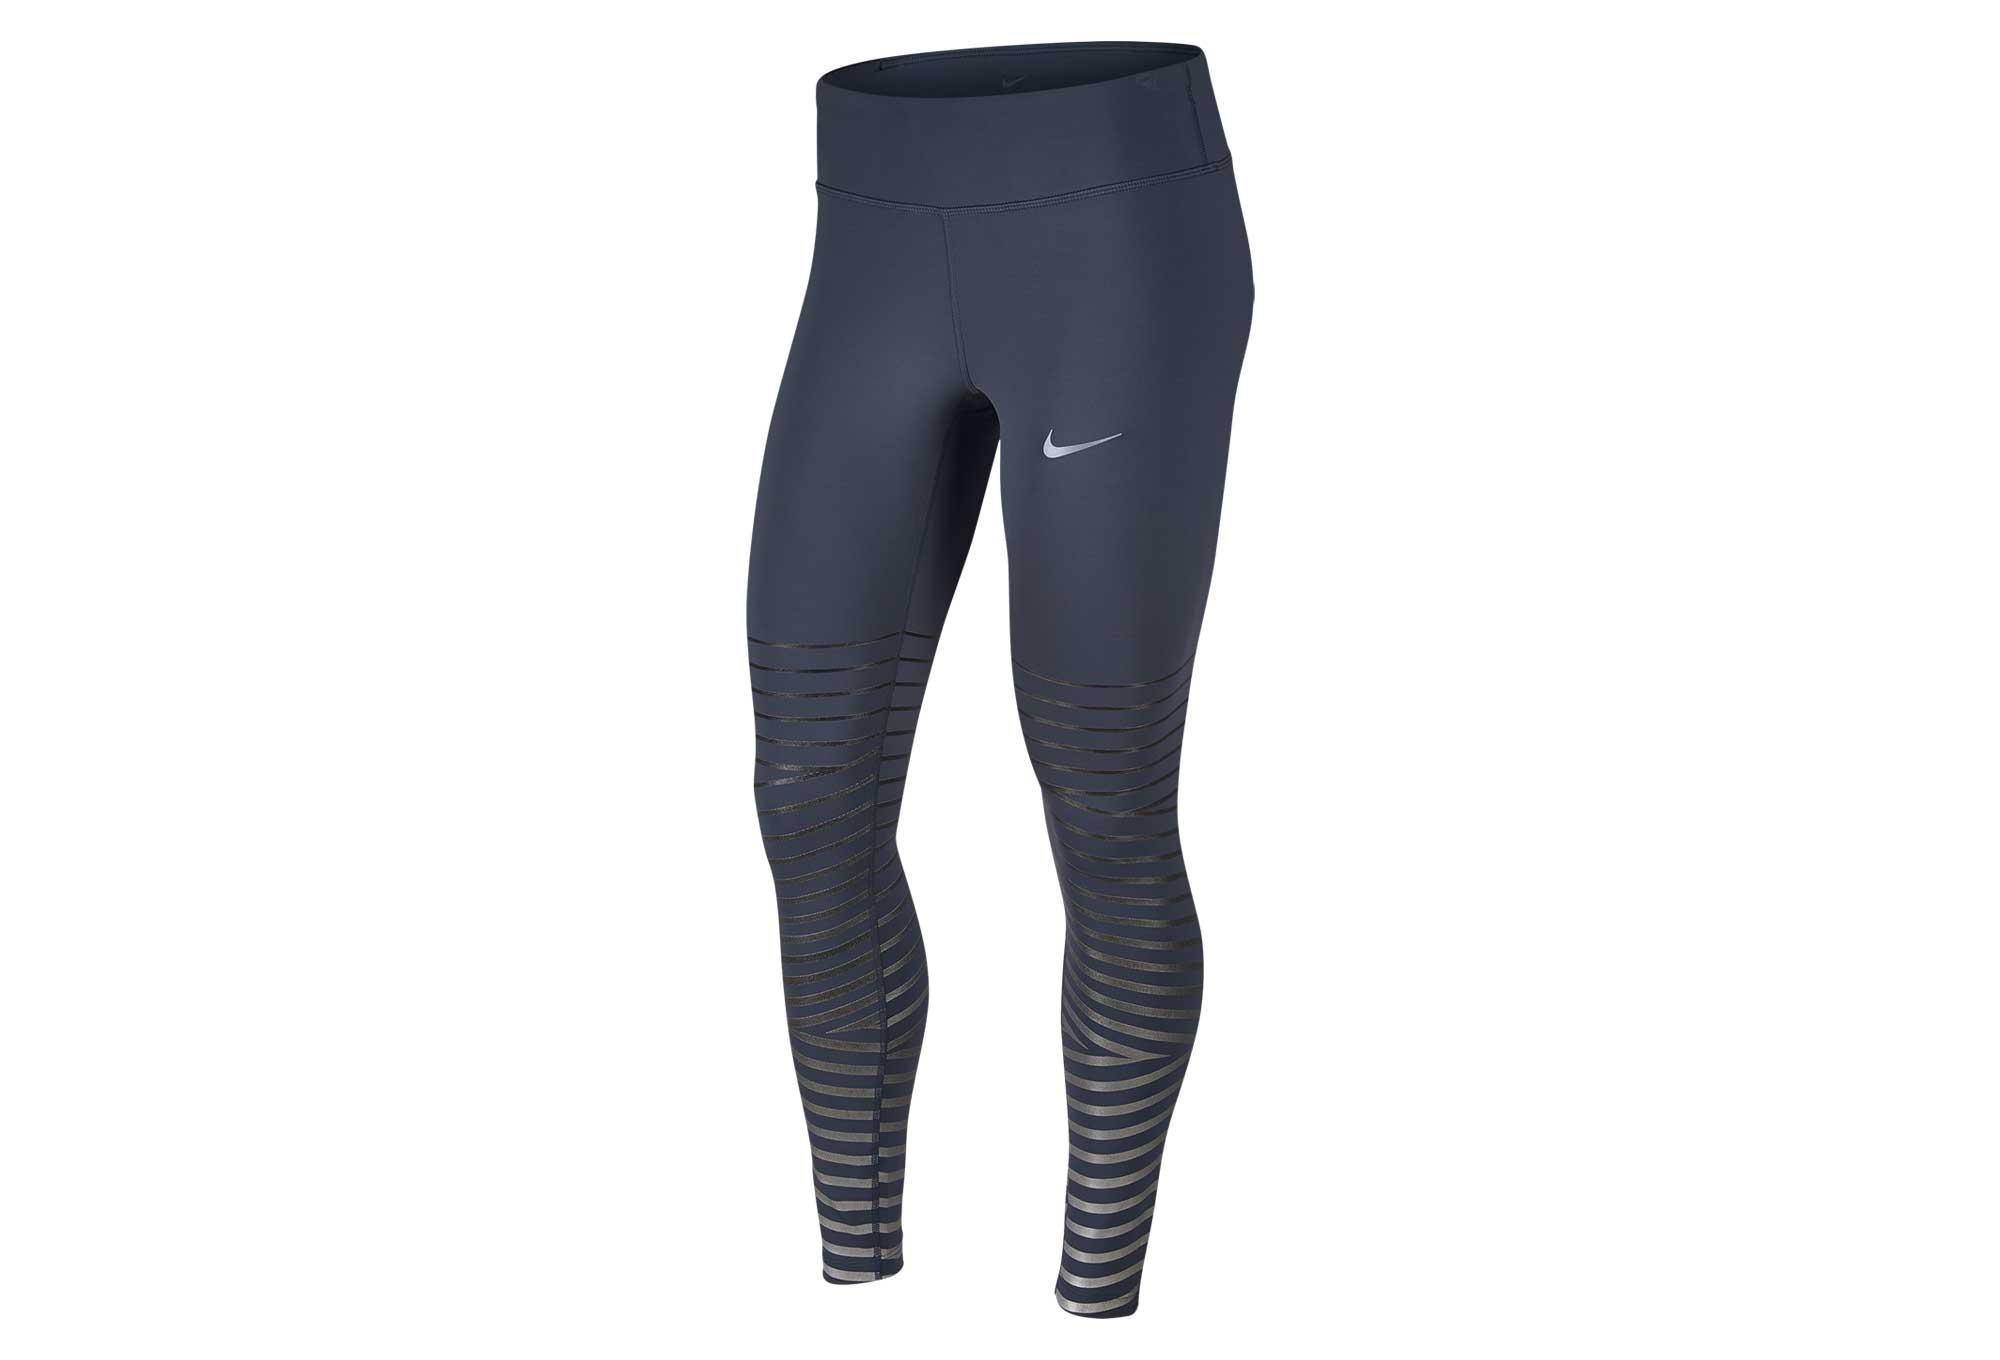 Collant Long Nike Power Epic Lux Flash Bleu Gris Femme  e472bab5796